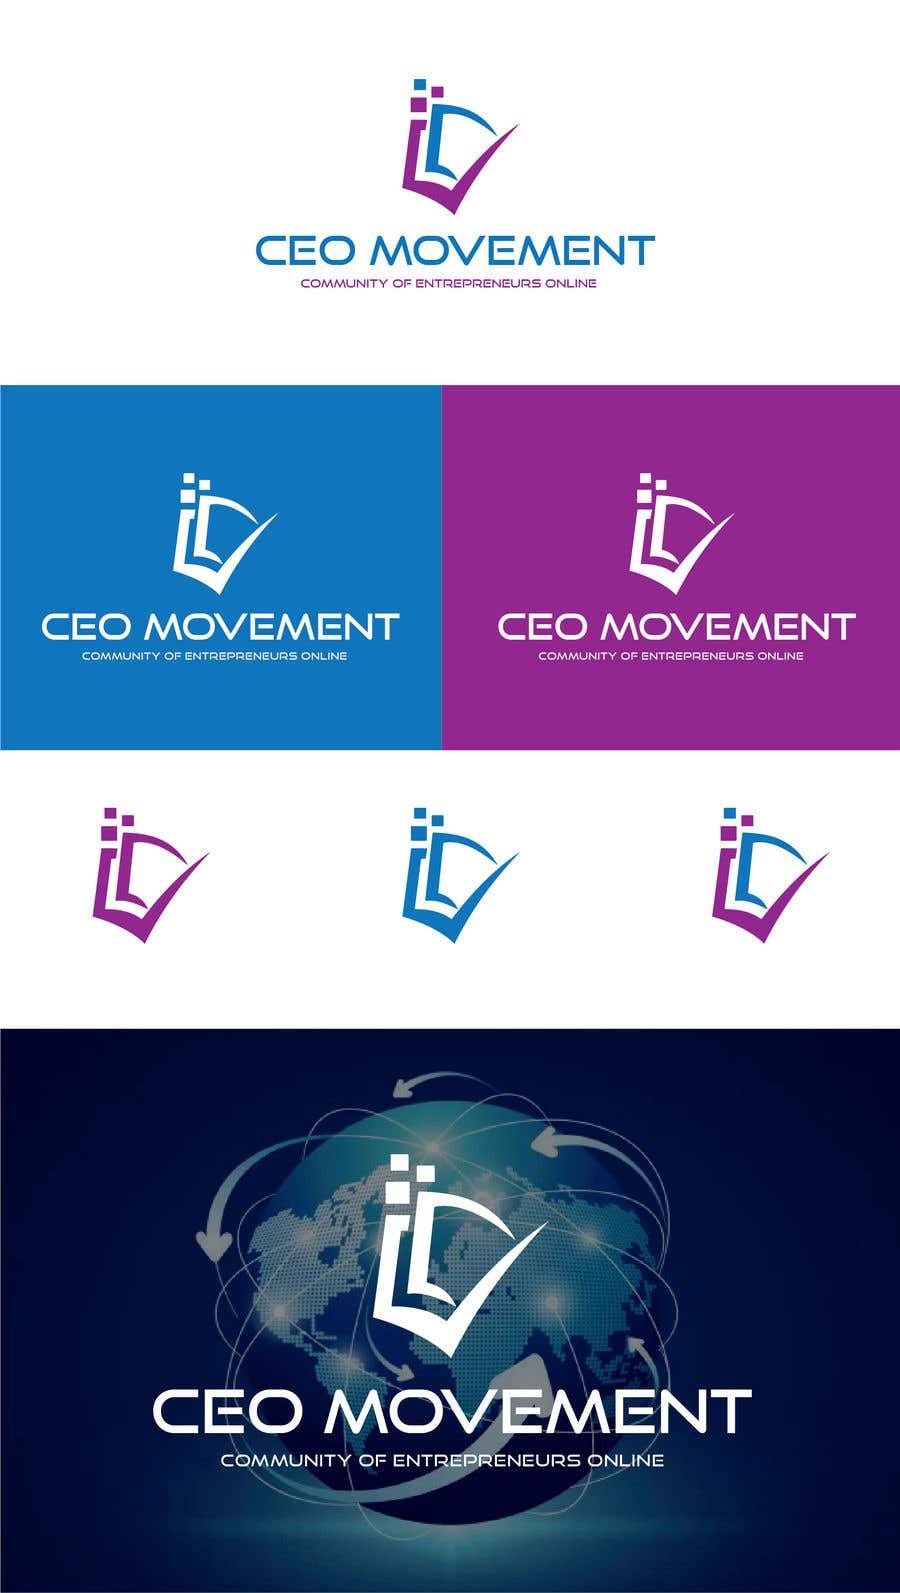 Bài tham dự cuộc thi #74 cho Professional Logo Design